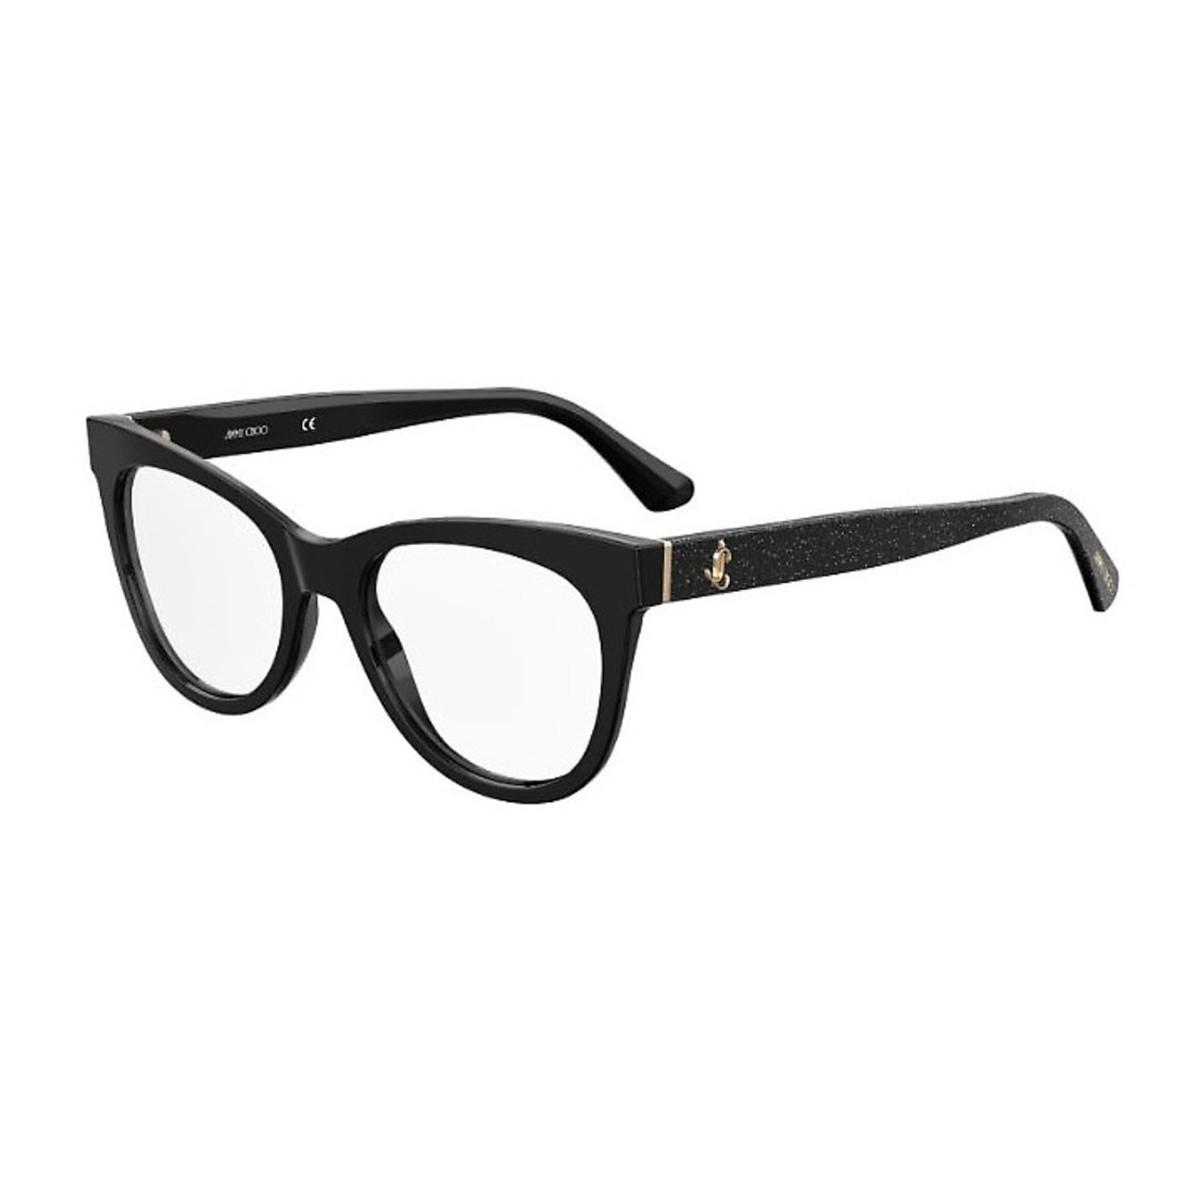 Jimmy Choo Jc276 | Women's eyeglasses